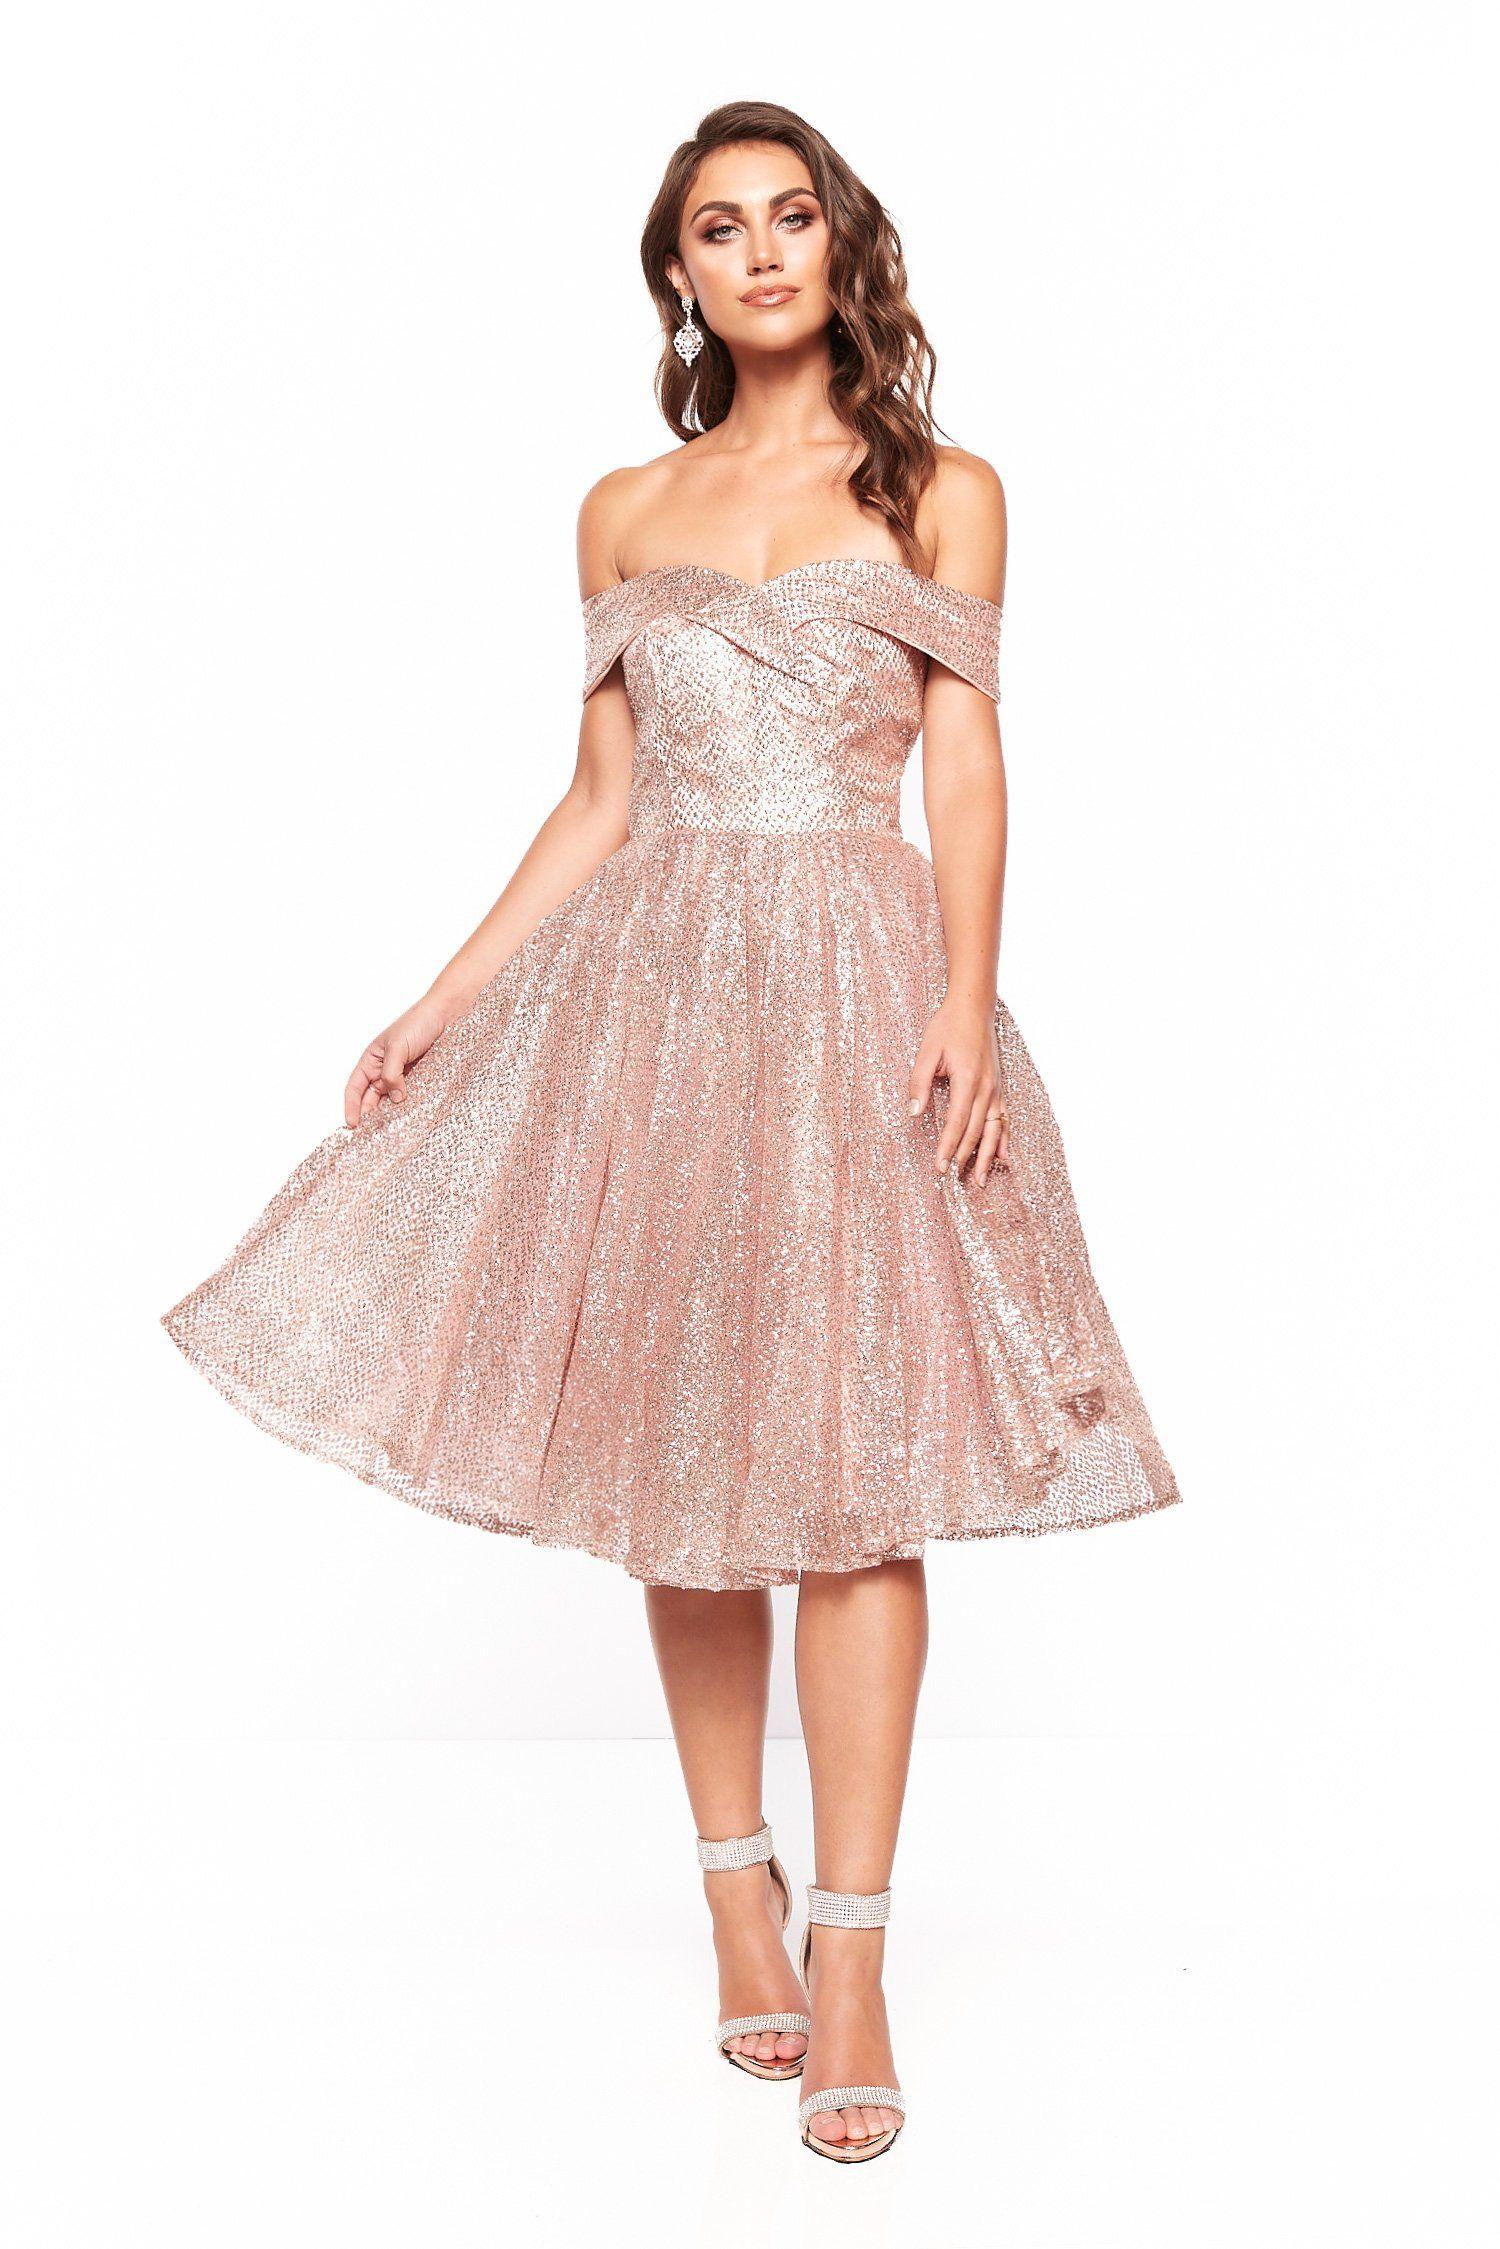 a8b07533926bd0 A&N Nyla Glitter Cocktail Dress - Rose Gold in 2019 | Glitter ...